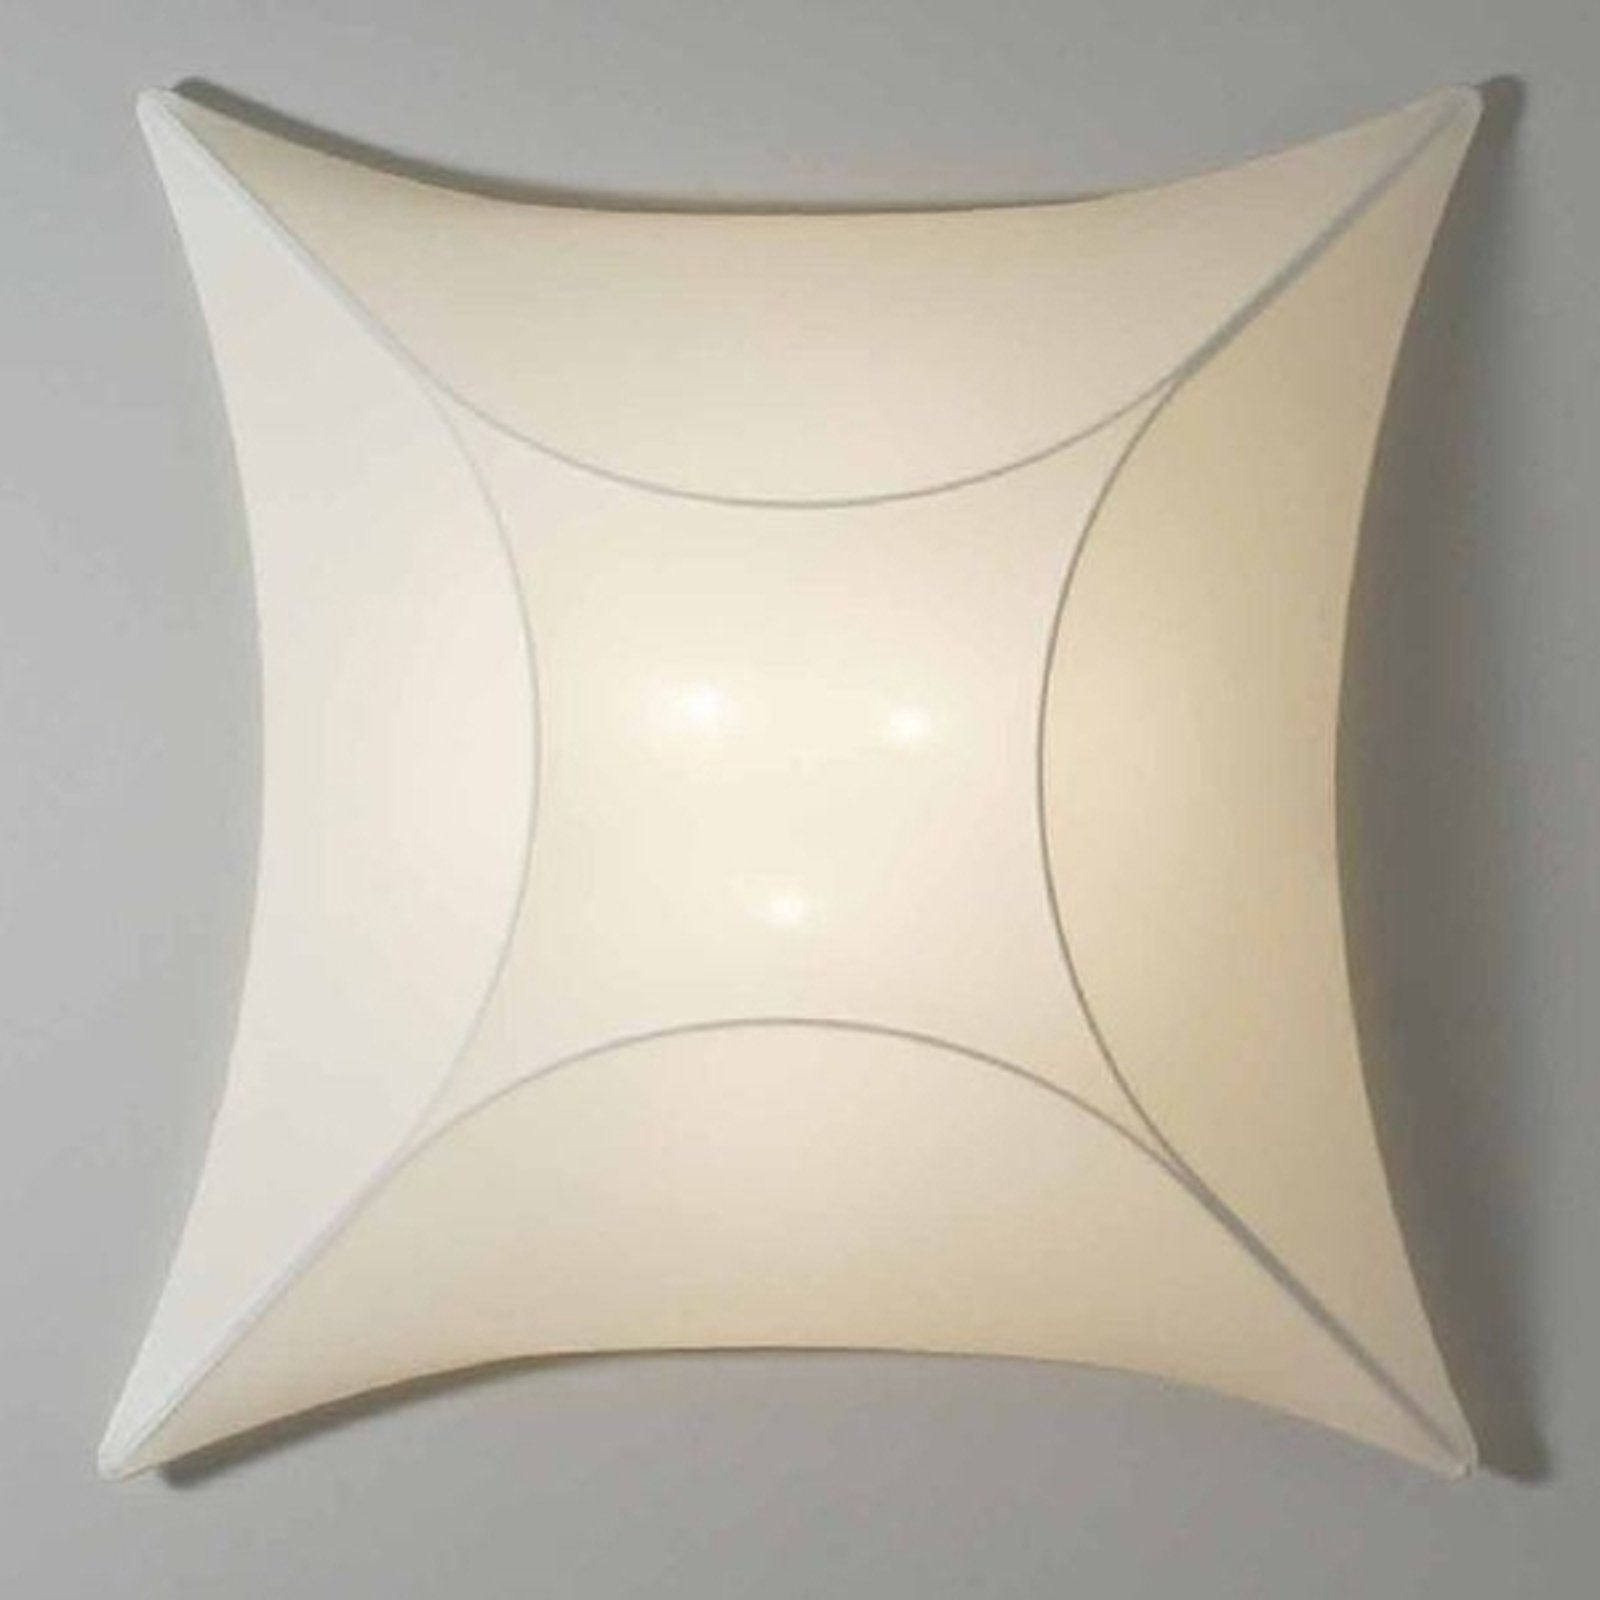 Ekstraordinær Rino vegglampe 90 cm x 90 cm